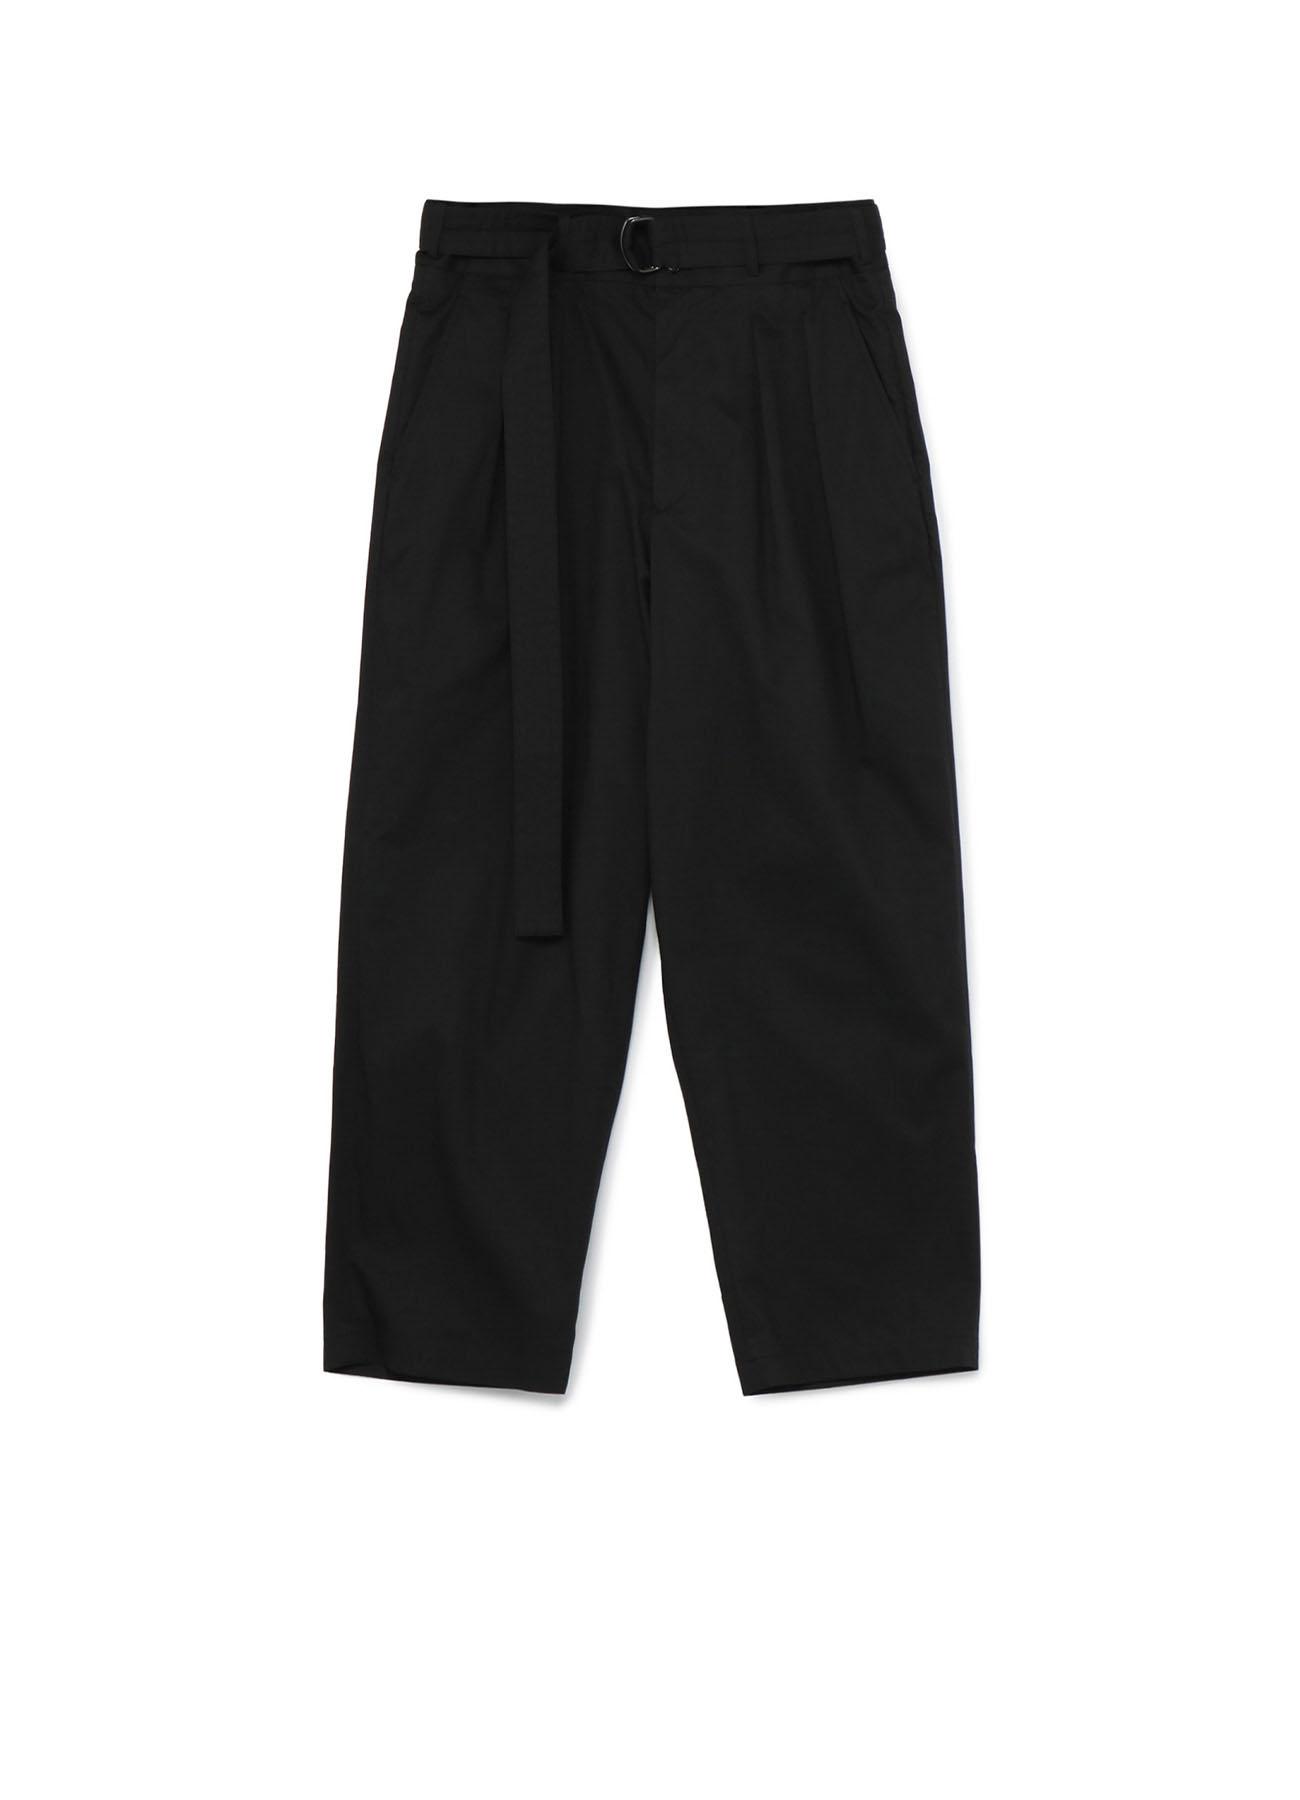 Cotton Twill 2-Tuck Tapered Belt Pants